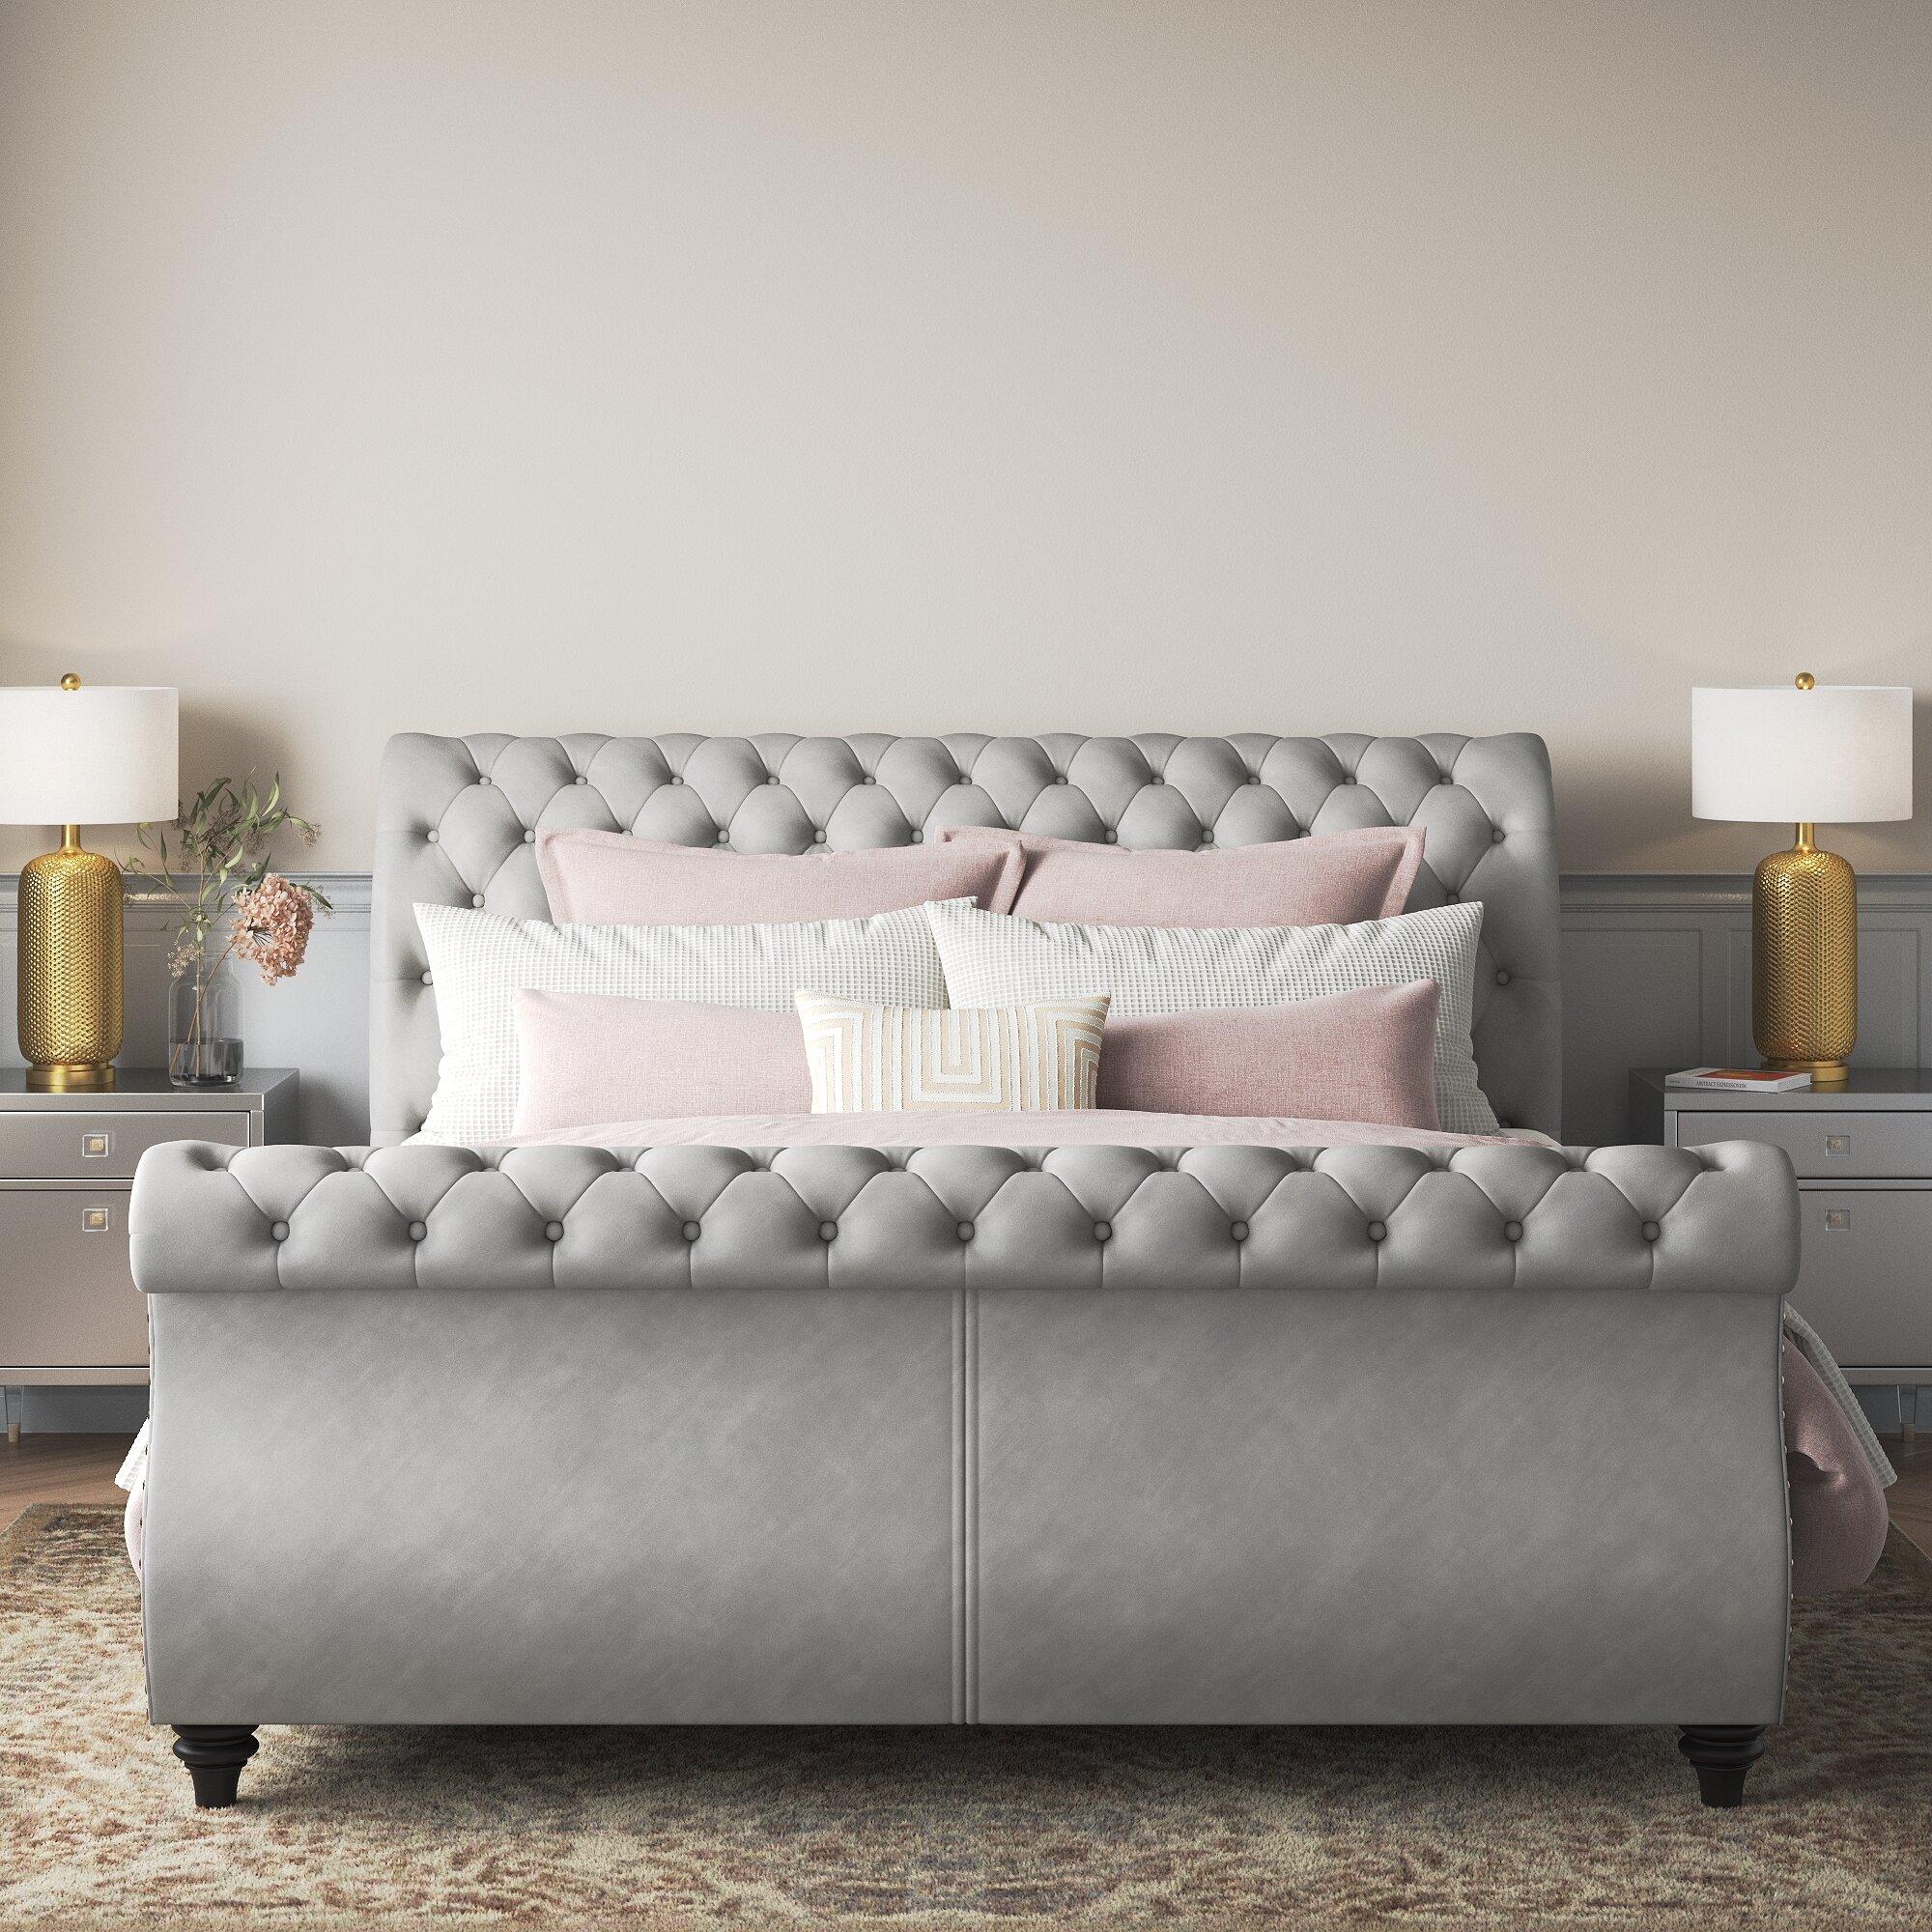 Rosdorf Park Matos Tufted Upholstered Sleigh Bed Reviews Wayfair